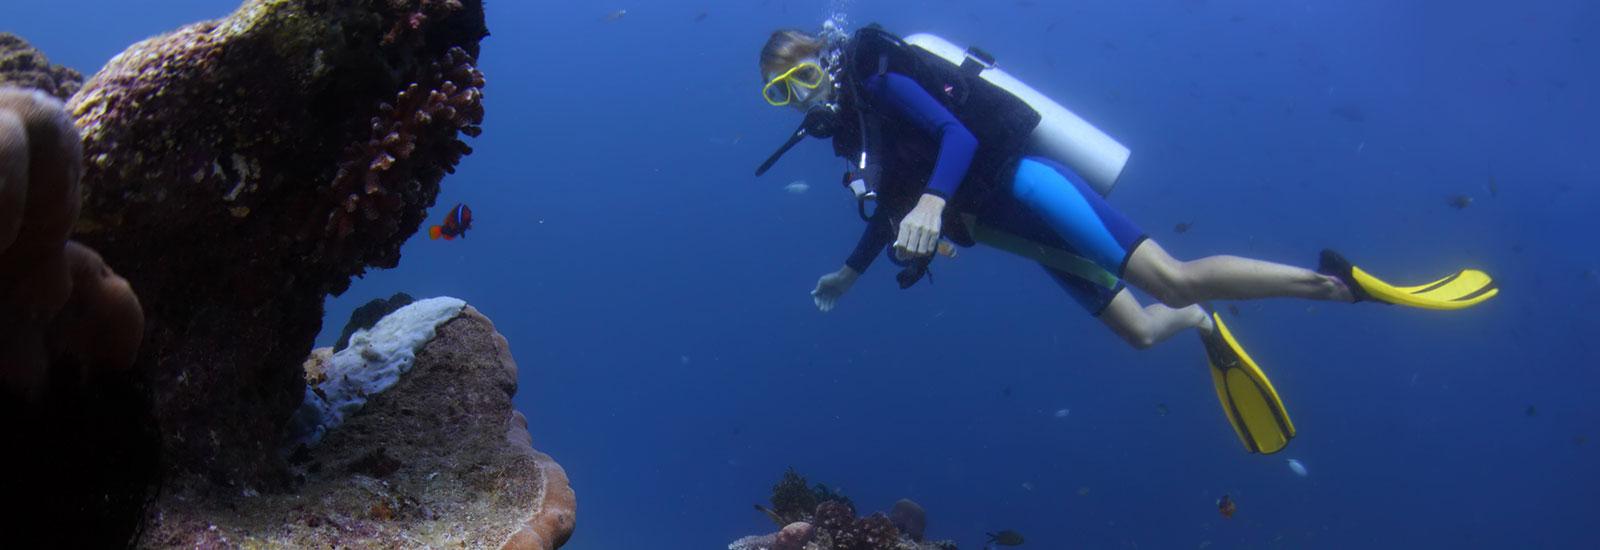 Adventure On Cruises - Scuba Diver